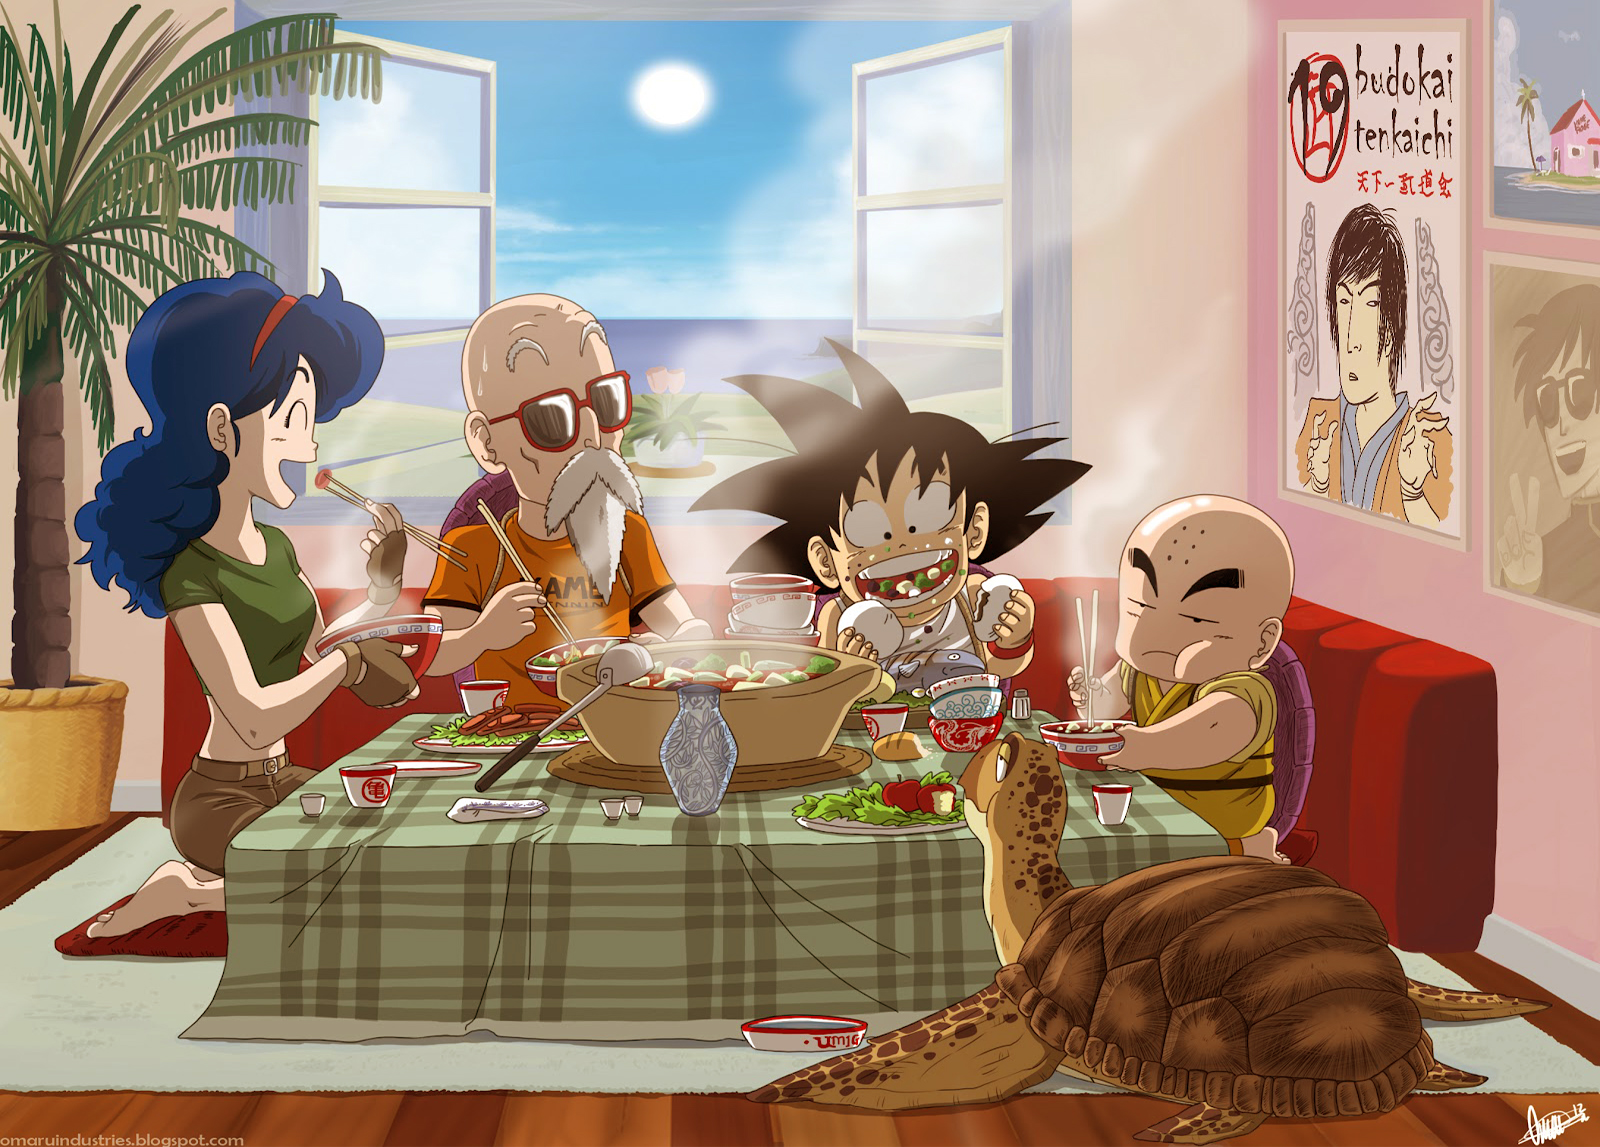 Goku Live Wallpaper Iphone 7 Plus My New Wallpaper The Turtle Hermit Way Dbz